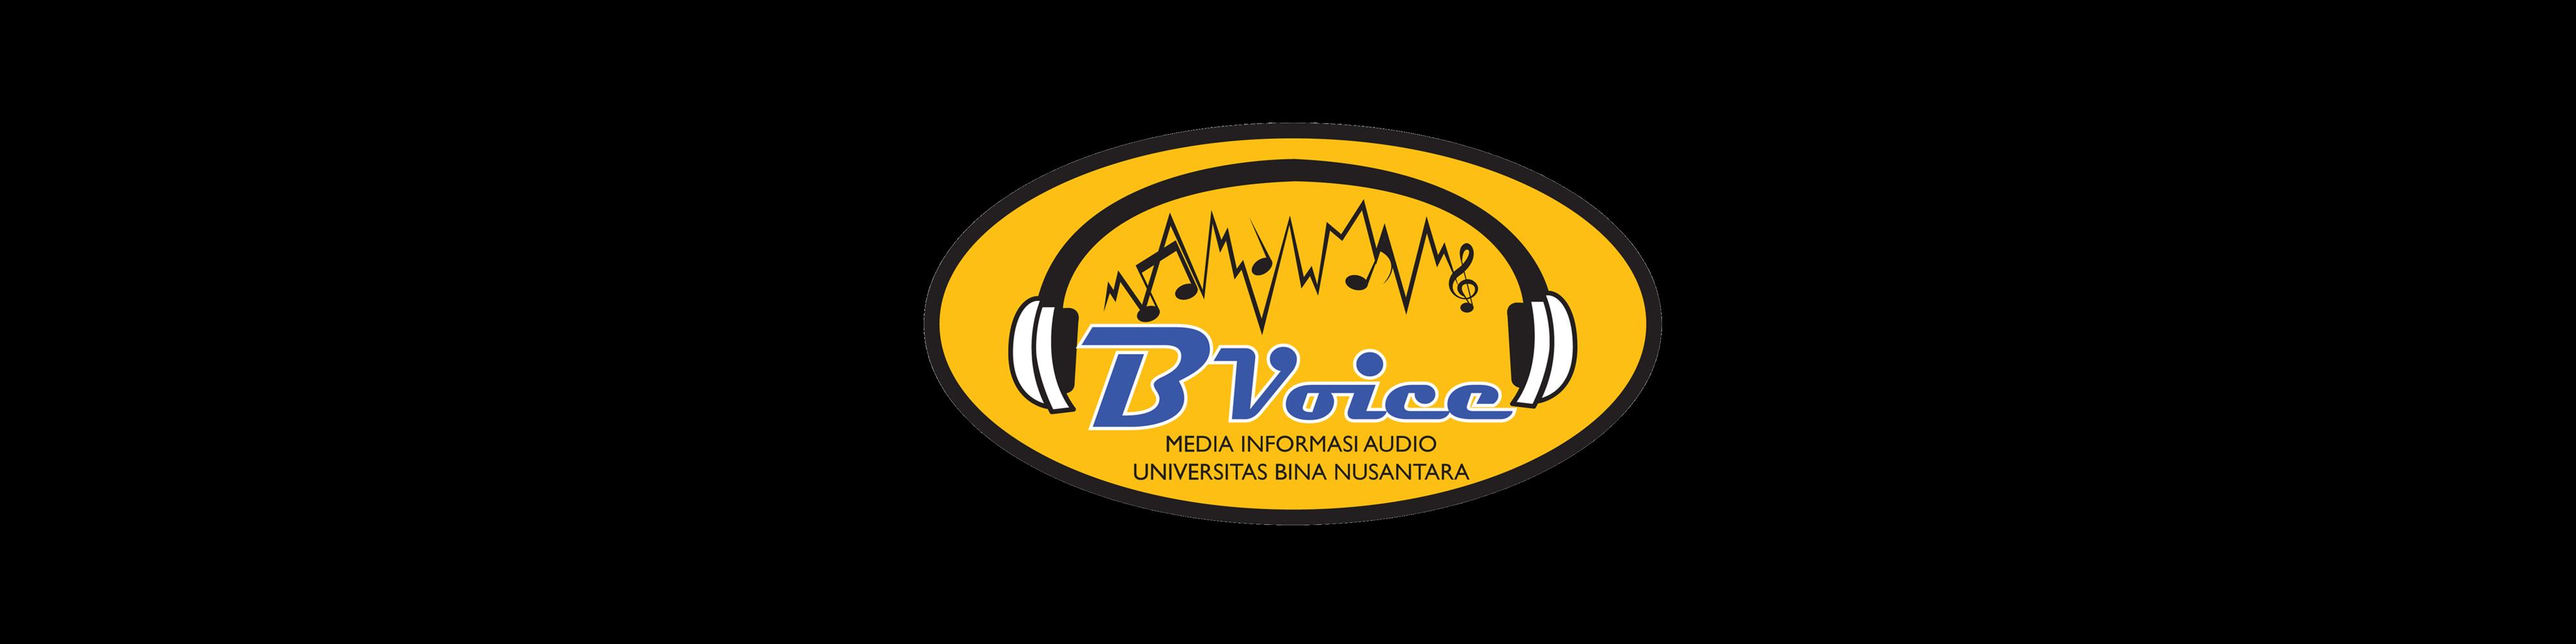 cropped-Logo-BVoice-2.png